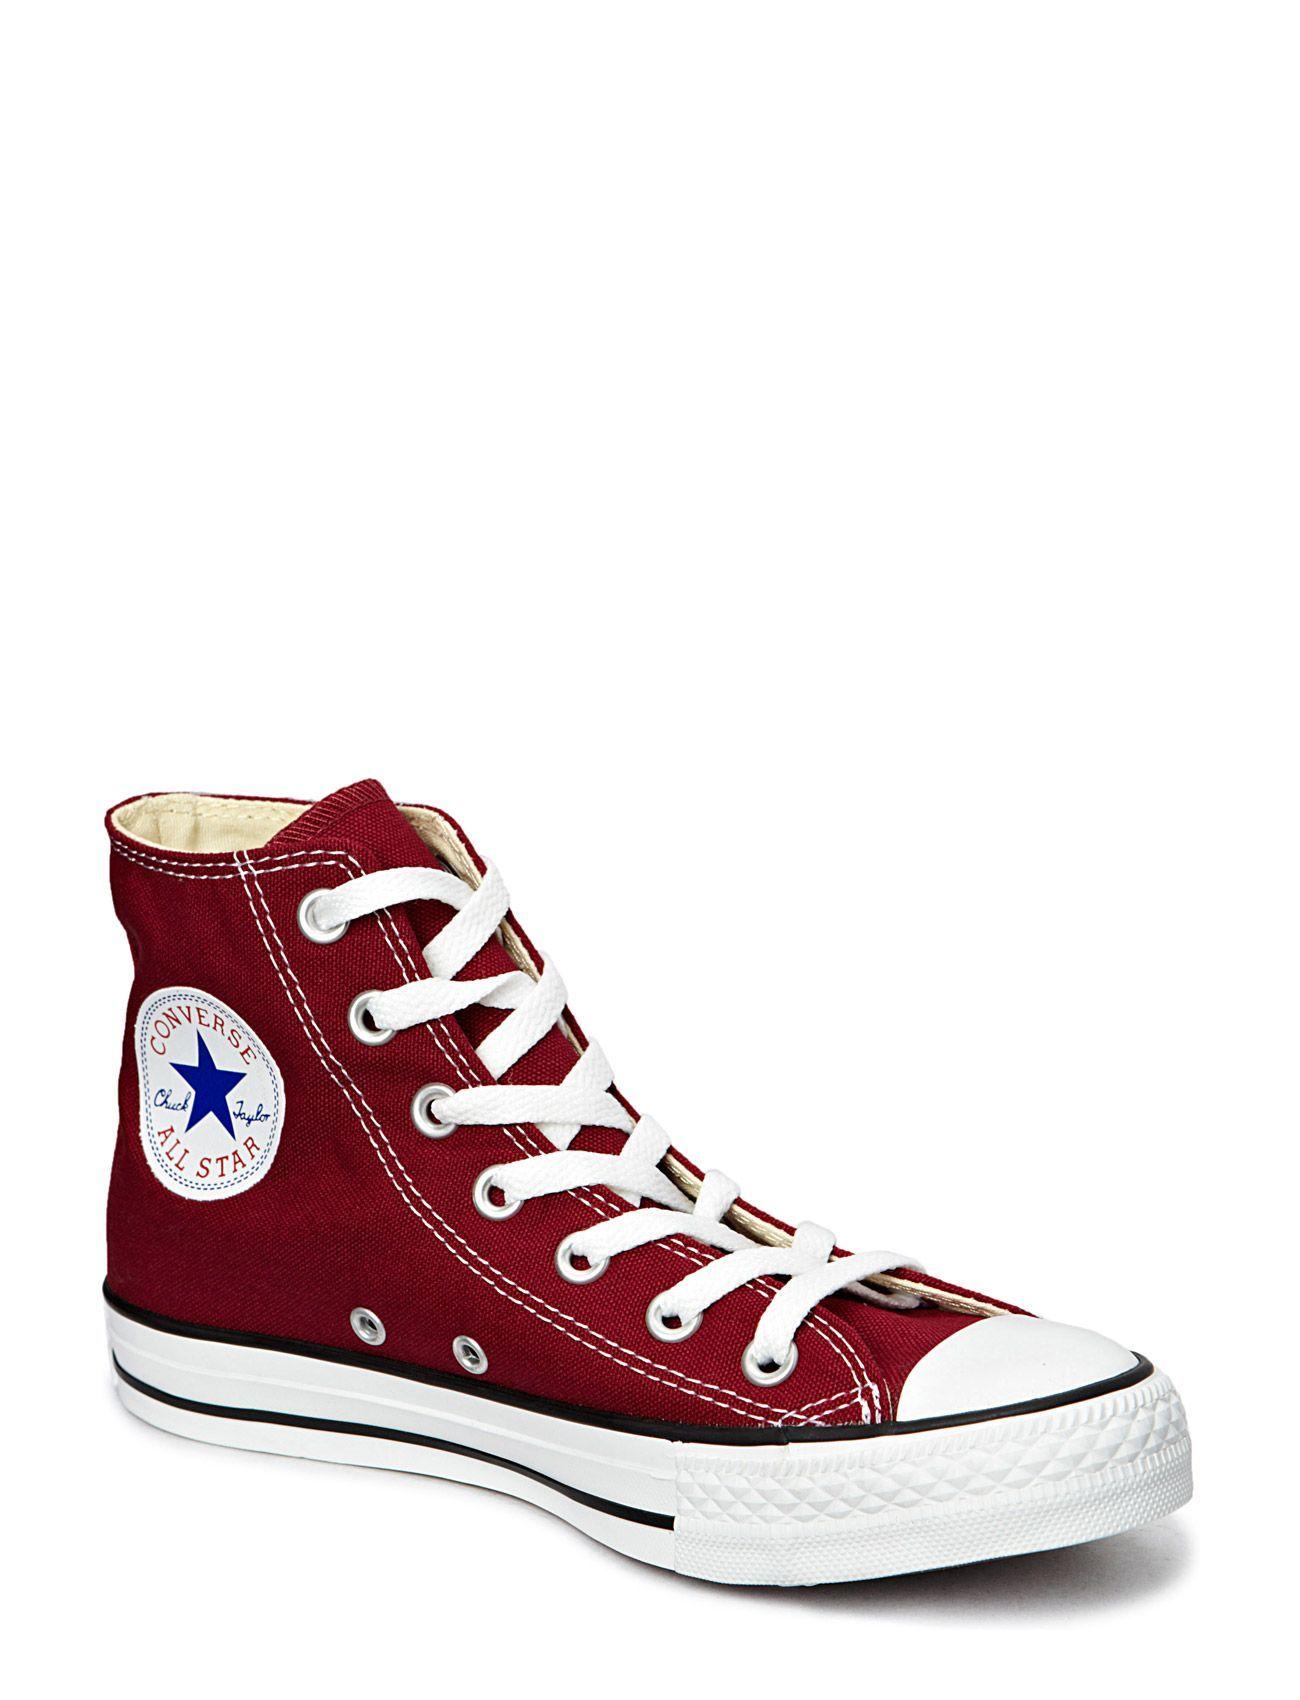 All Star Canvas Hi Converse Sneakers til Herrer i